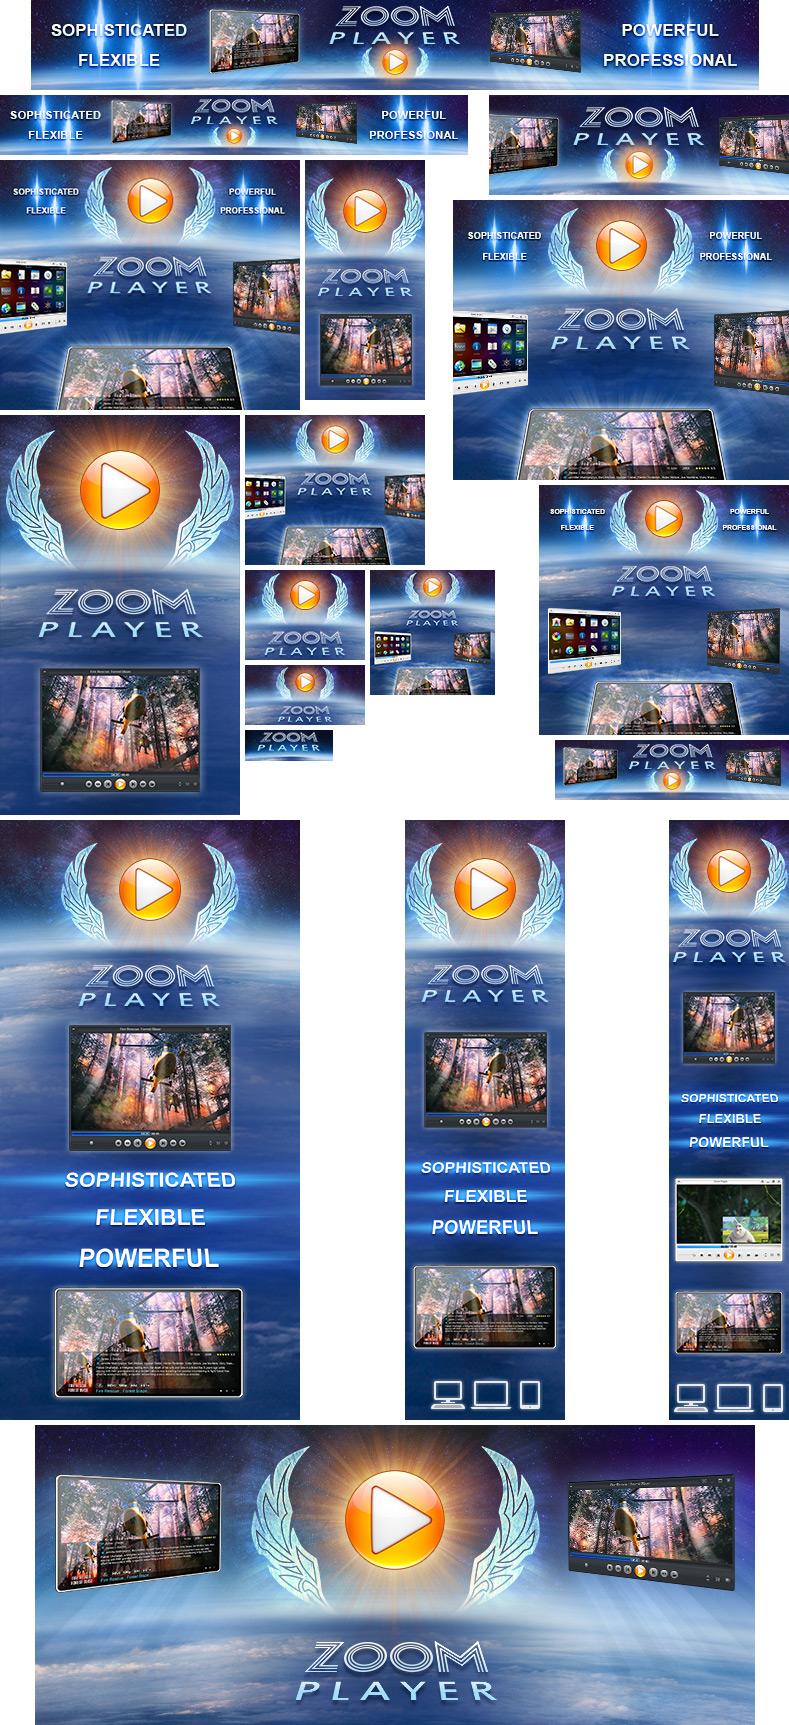 inmatrixcom zoom player banners